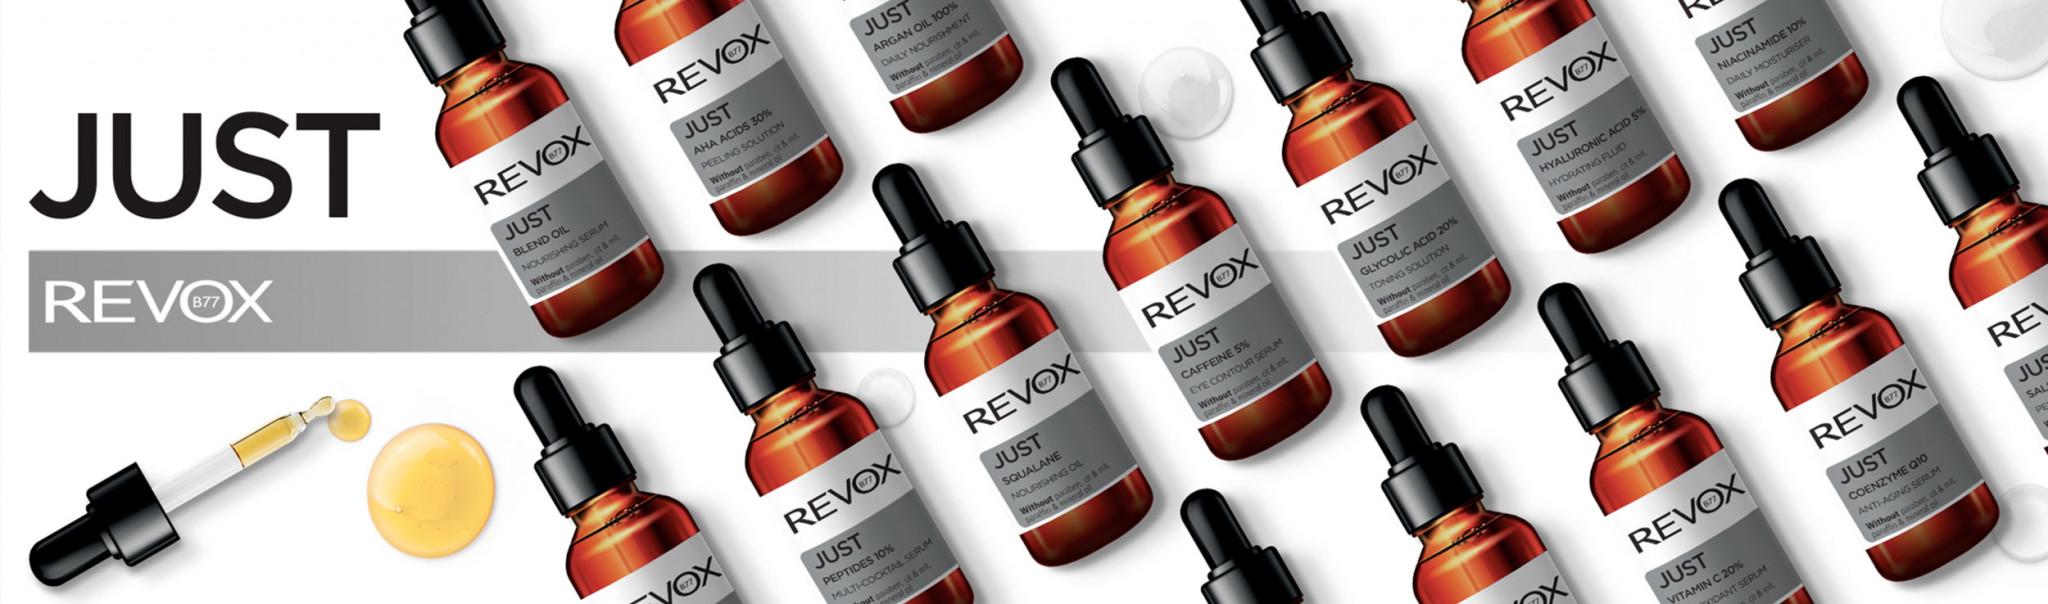 Revox